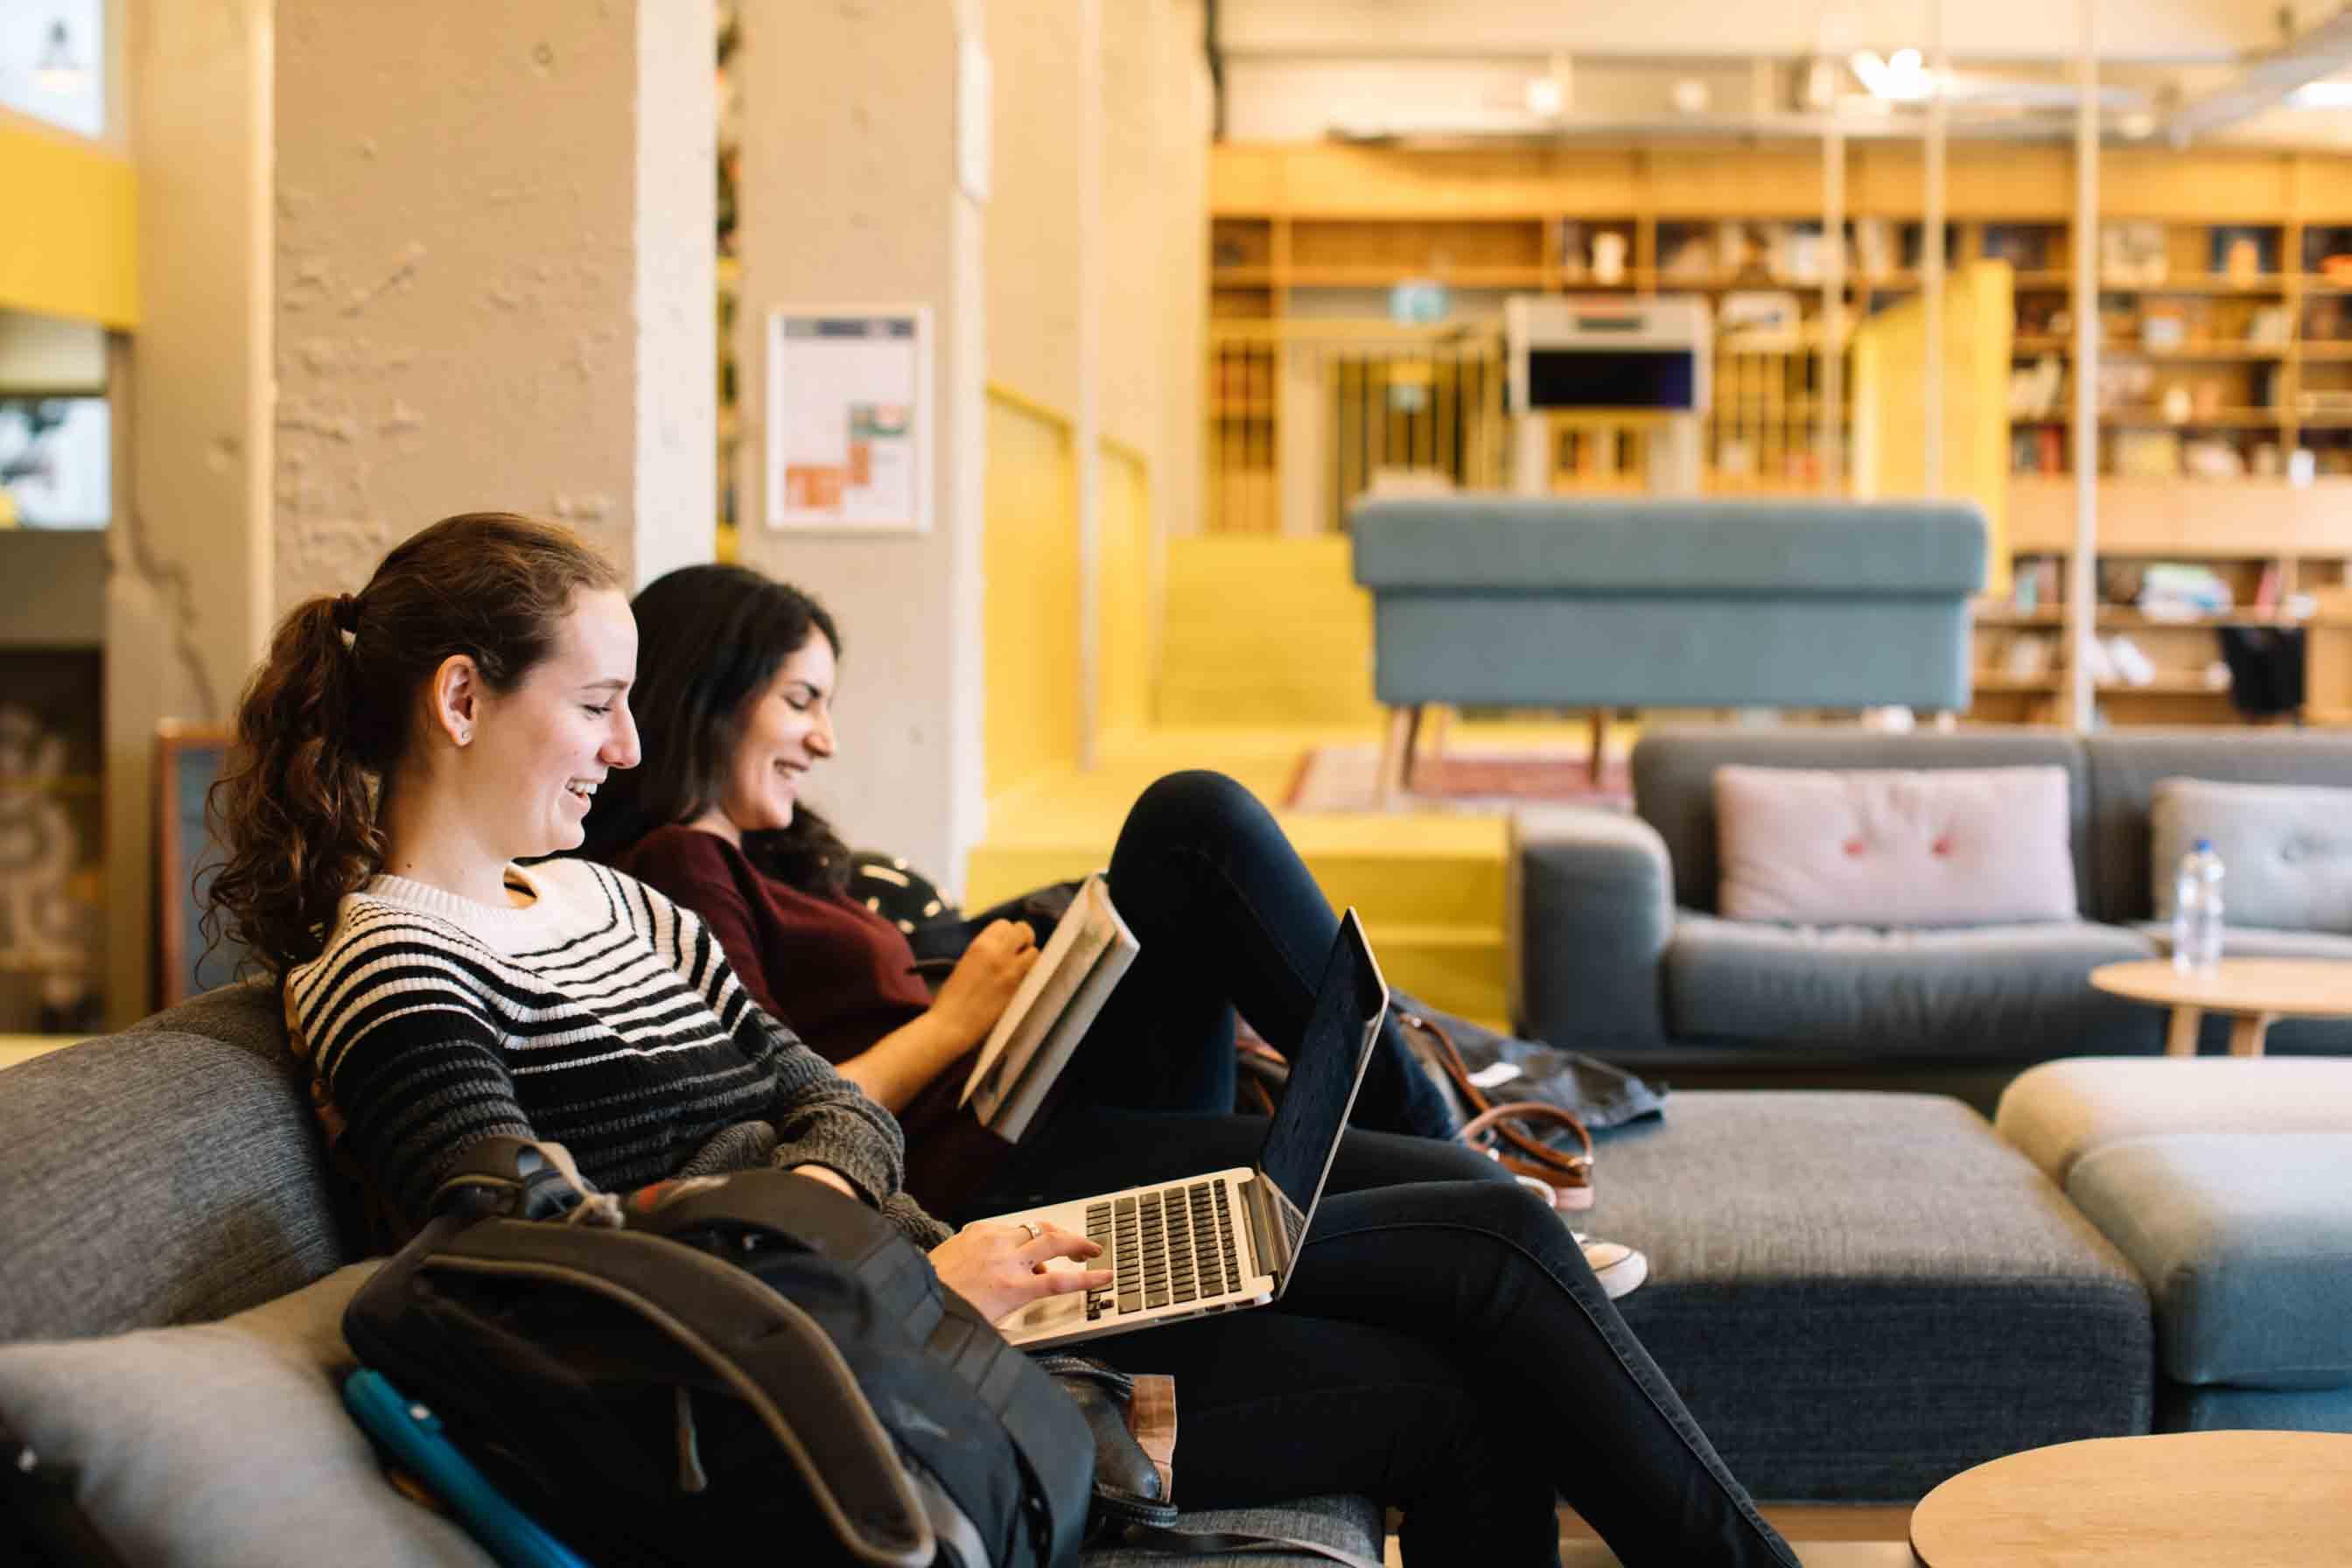 The role of higher education in nurturing entrepreneurship